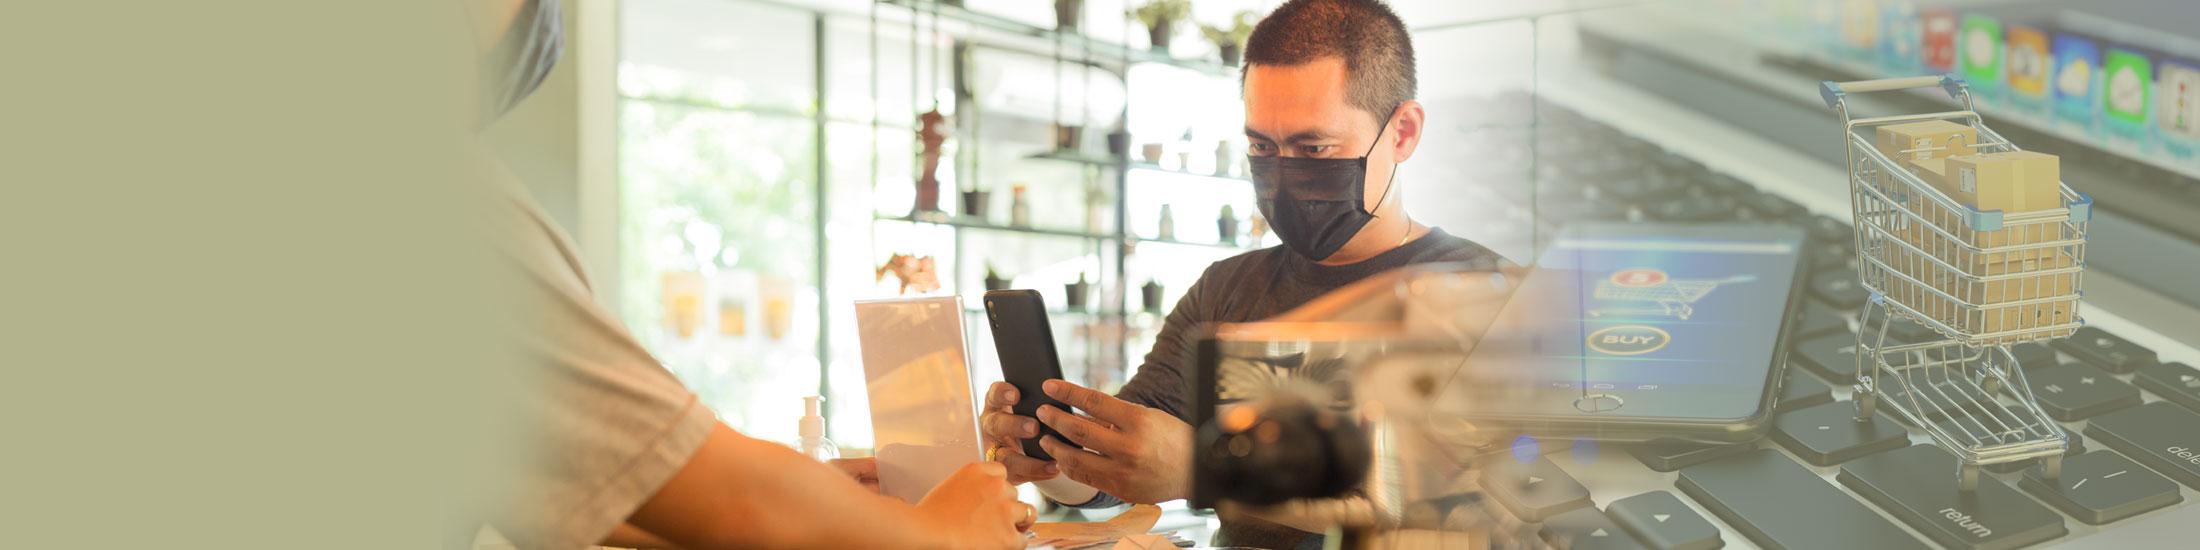 Pandemic Pushes Digital Wallet Adoption, Online Shopping Higher